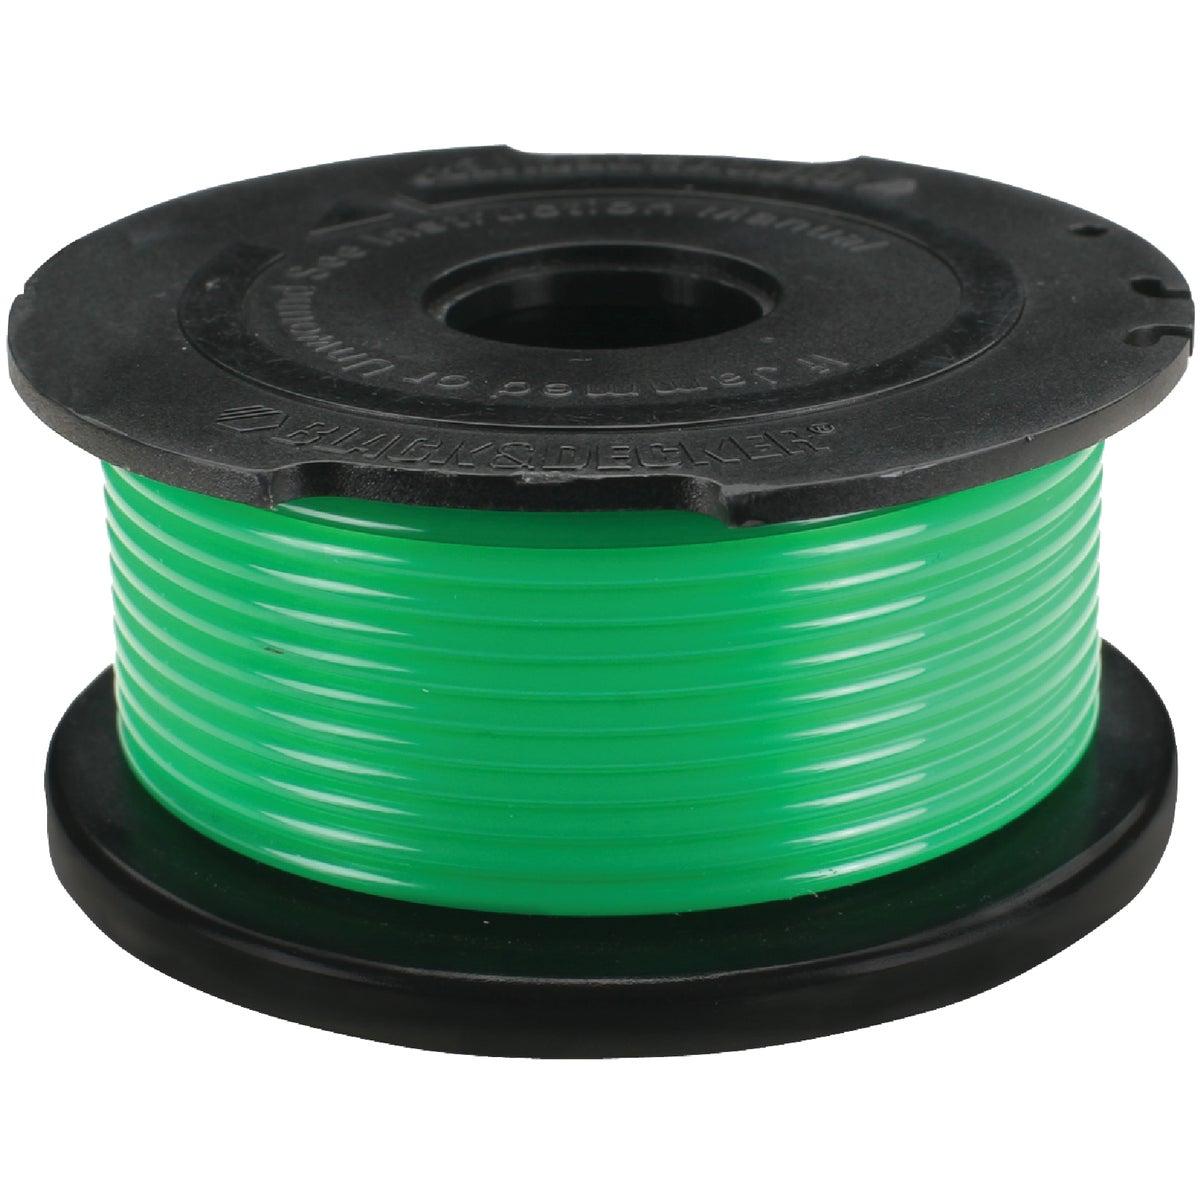 BLACK+DECKER SF-080 Auto Feed Spool Single Line Trimmer